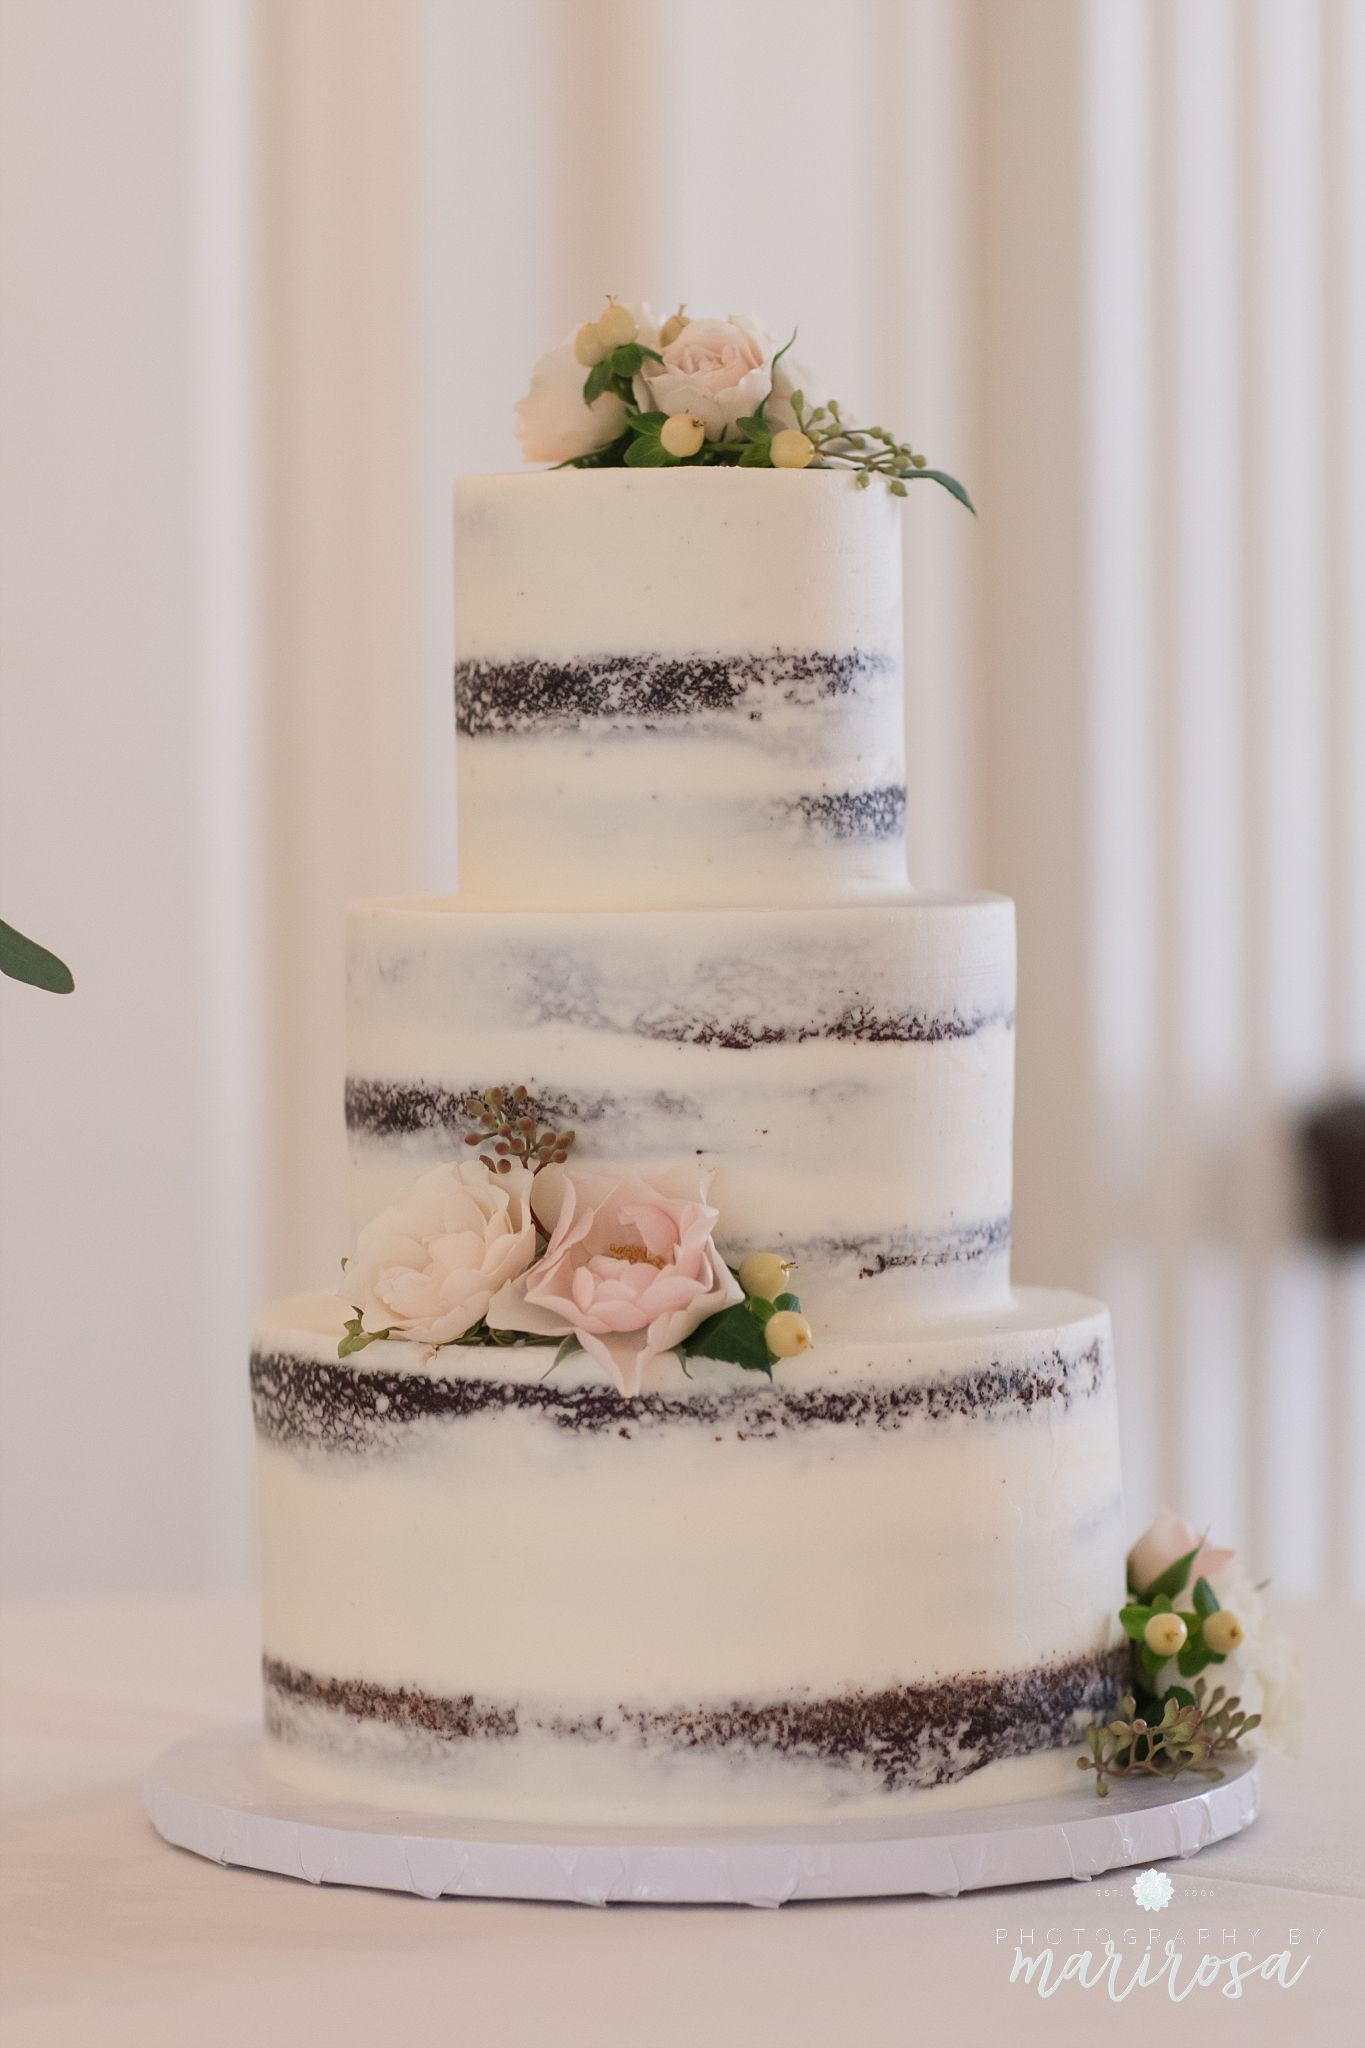 cake by Sweets by E www.photographybymarirosa.com